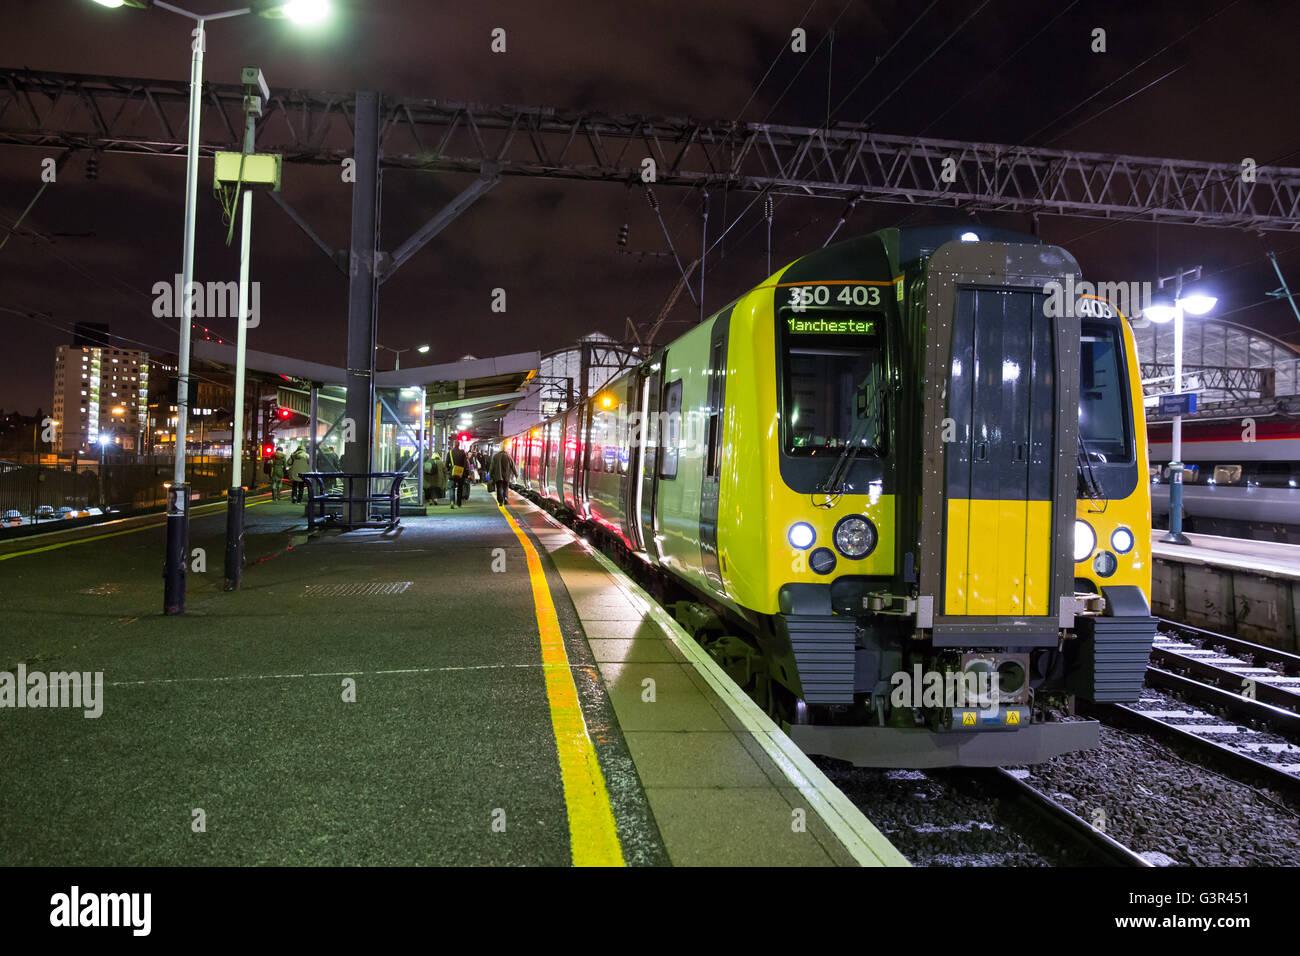 Transpennine Express 350403 at Manchester Piccadilly platform 13 - Stock Image